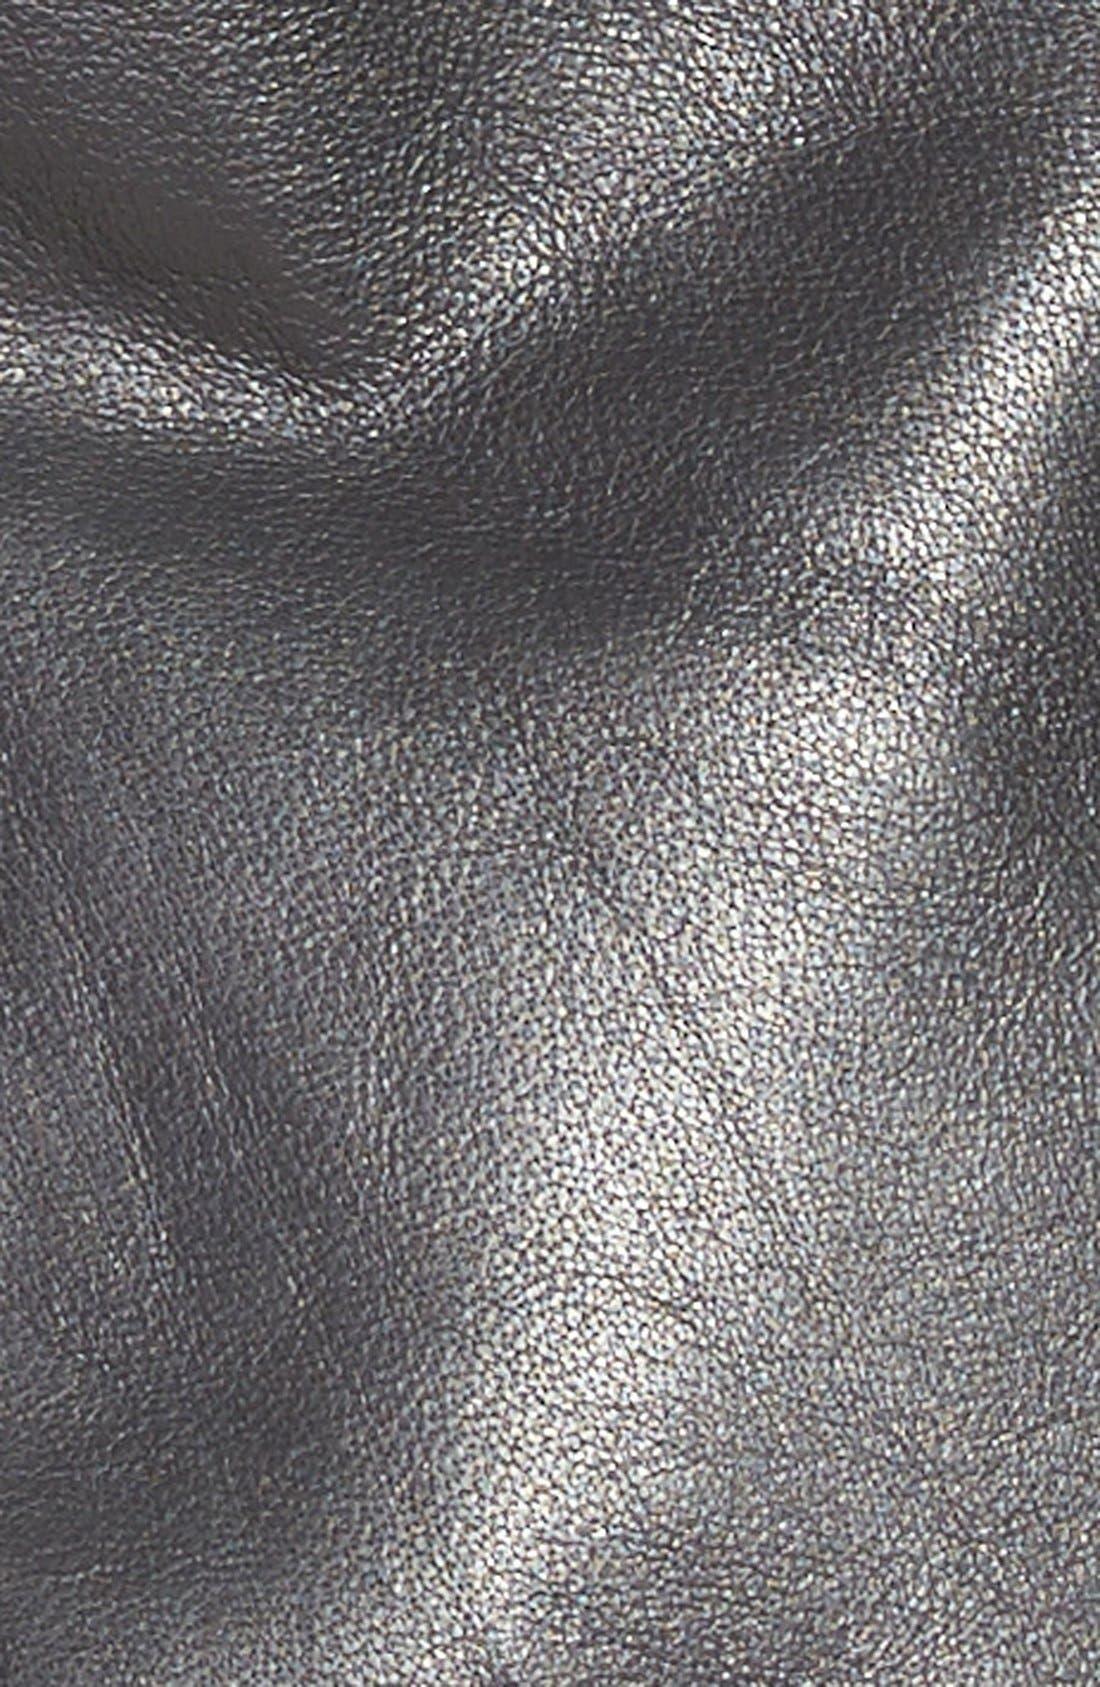 'Kirwin' Zip Front Leather Jacket,                             Alternate thumbnail 3, color,                             001